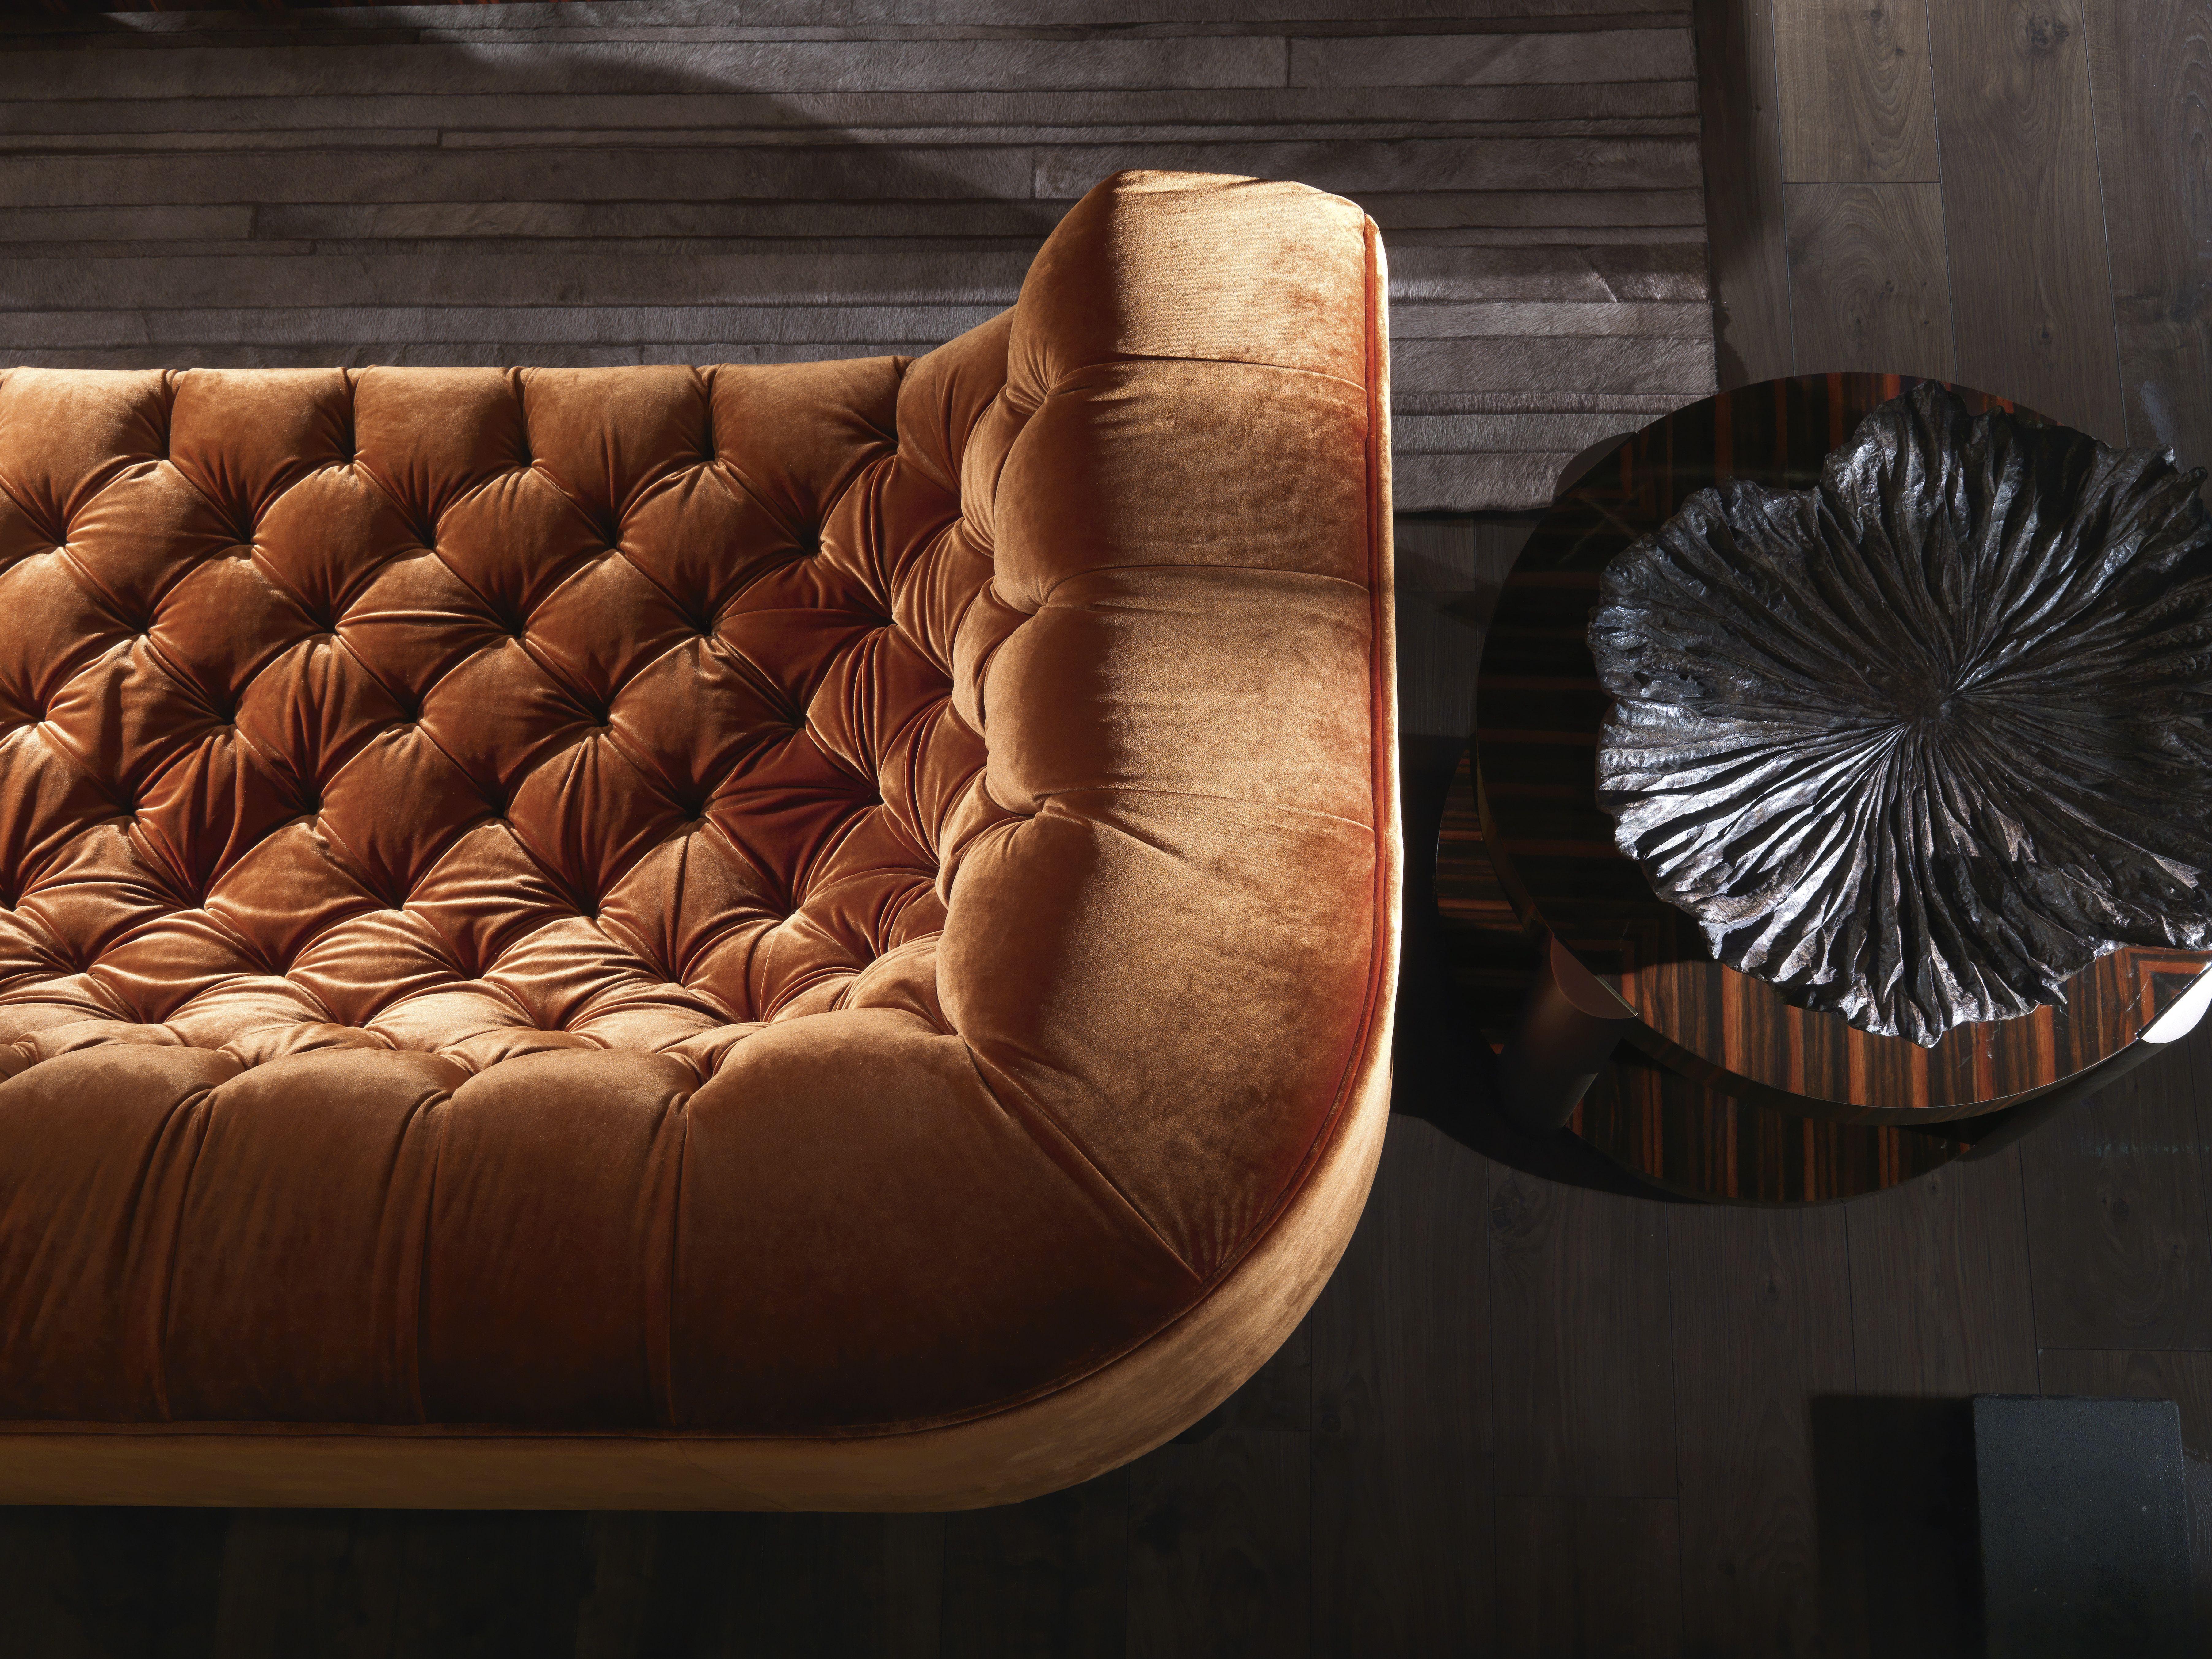 Roberto Cavalli Sofa Interiors Interiorsstylist Robertocavalliinteriors Hotel Furniture Luxury Interior Furniture